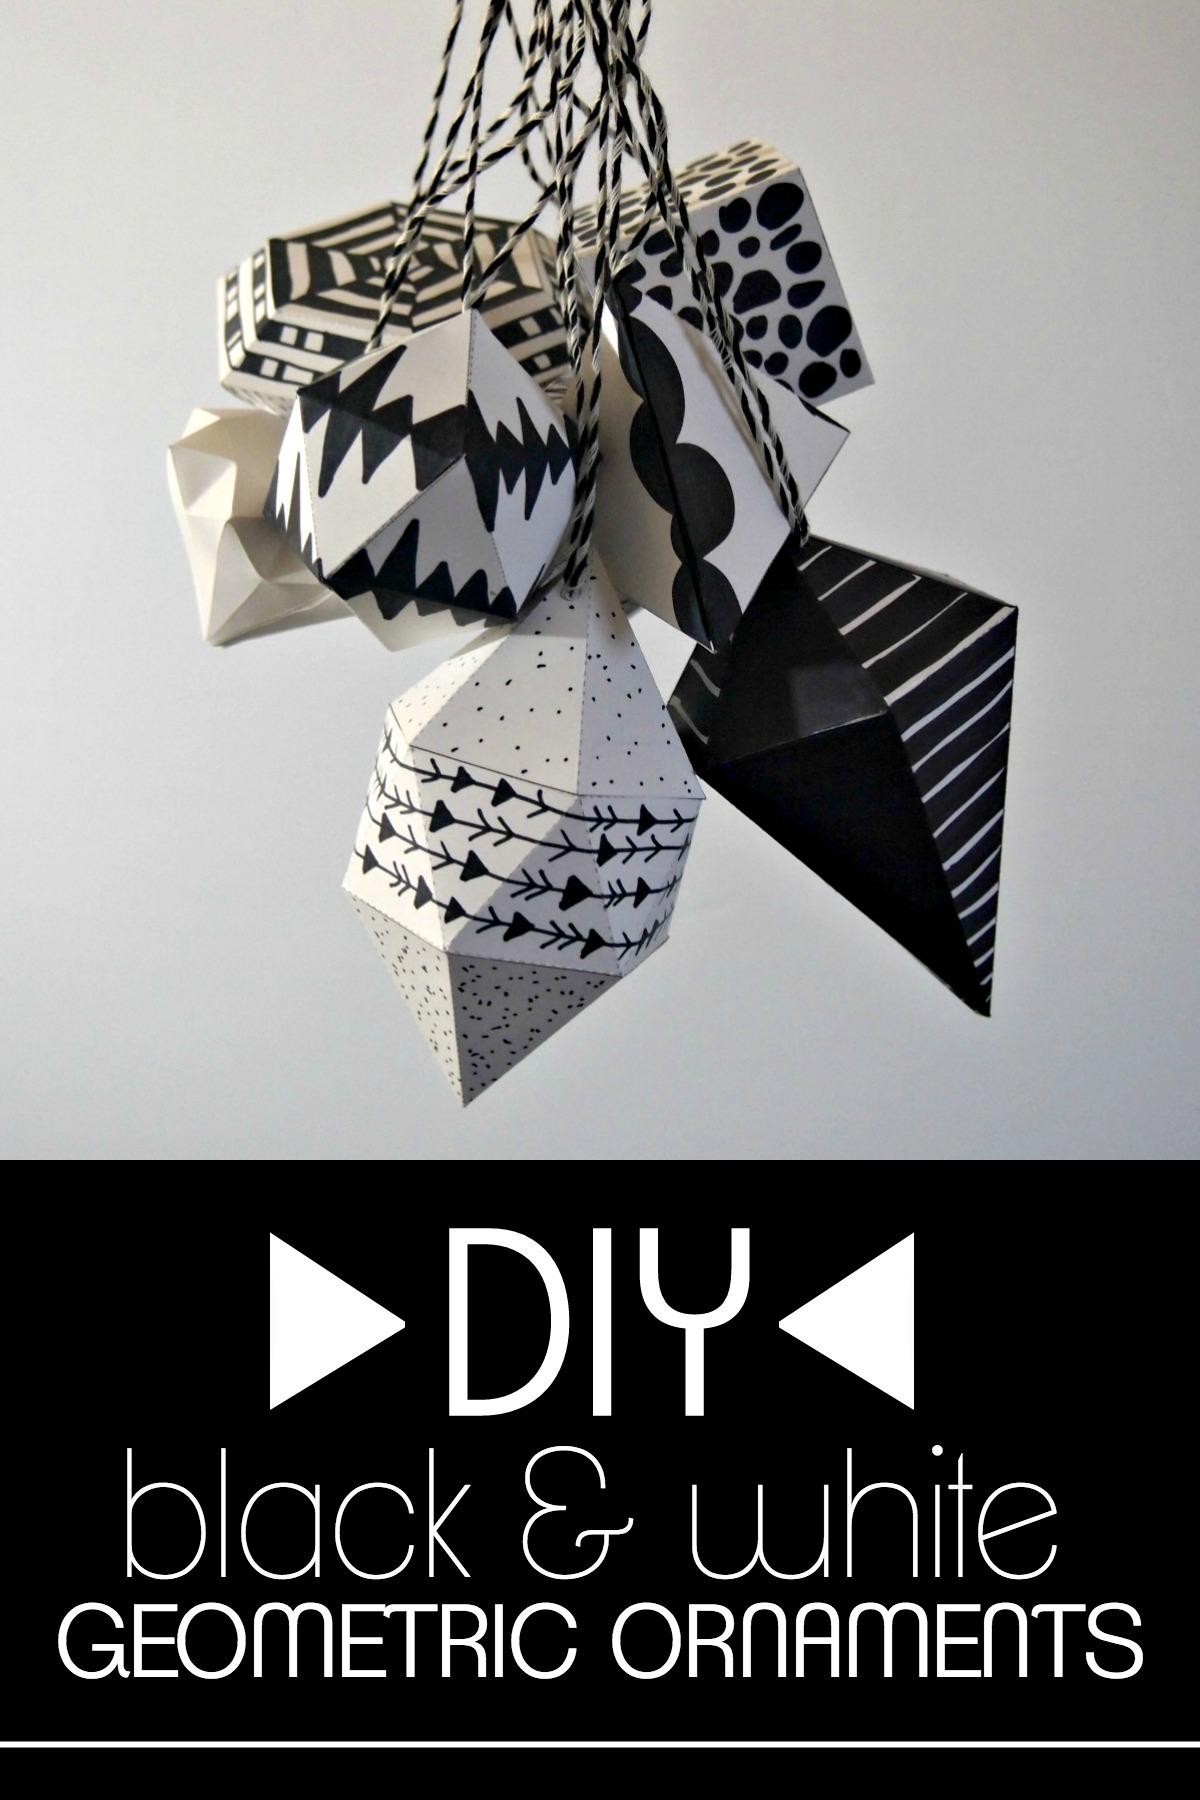 DIY black and white geometric ornaments